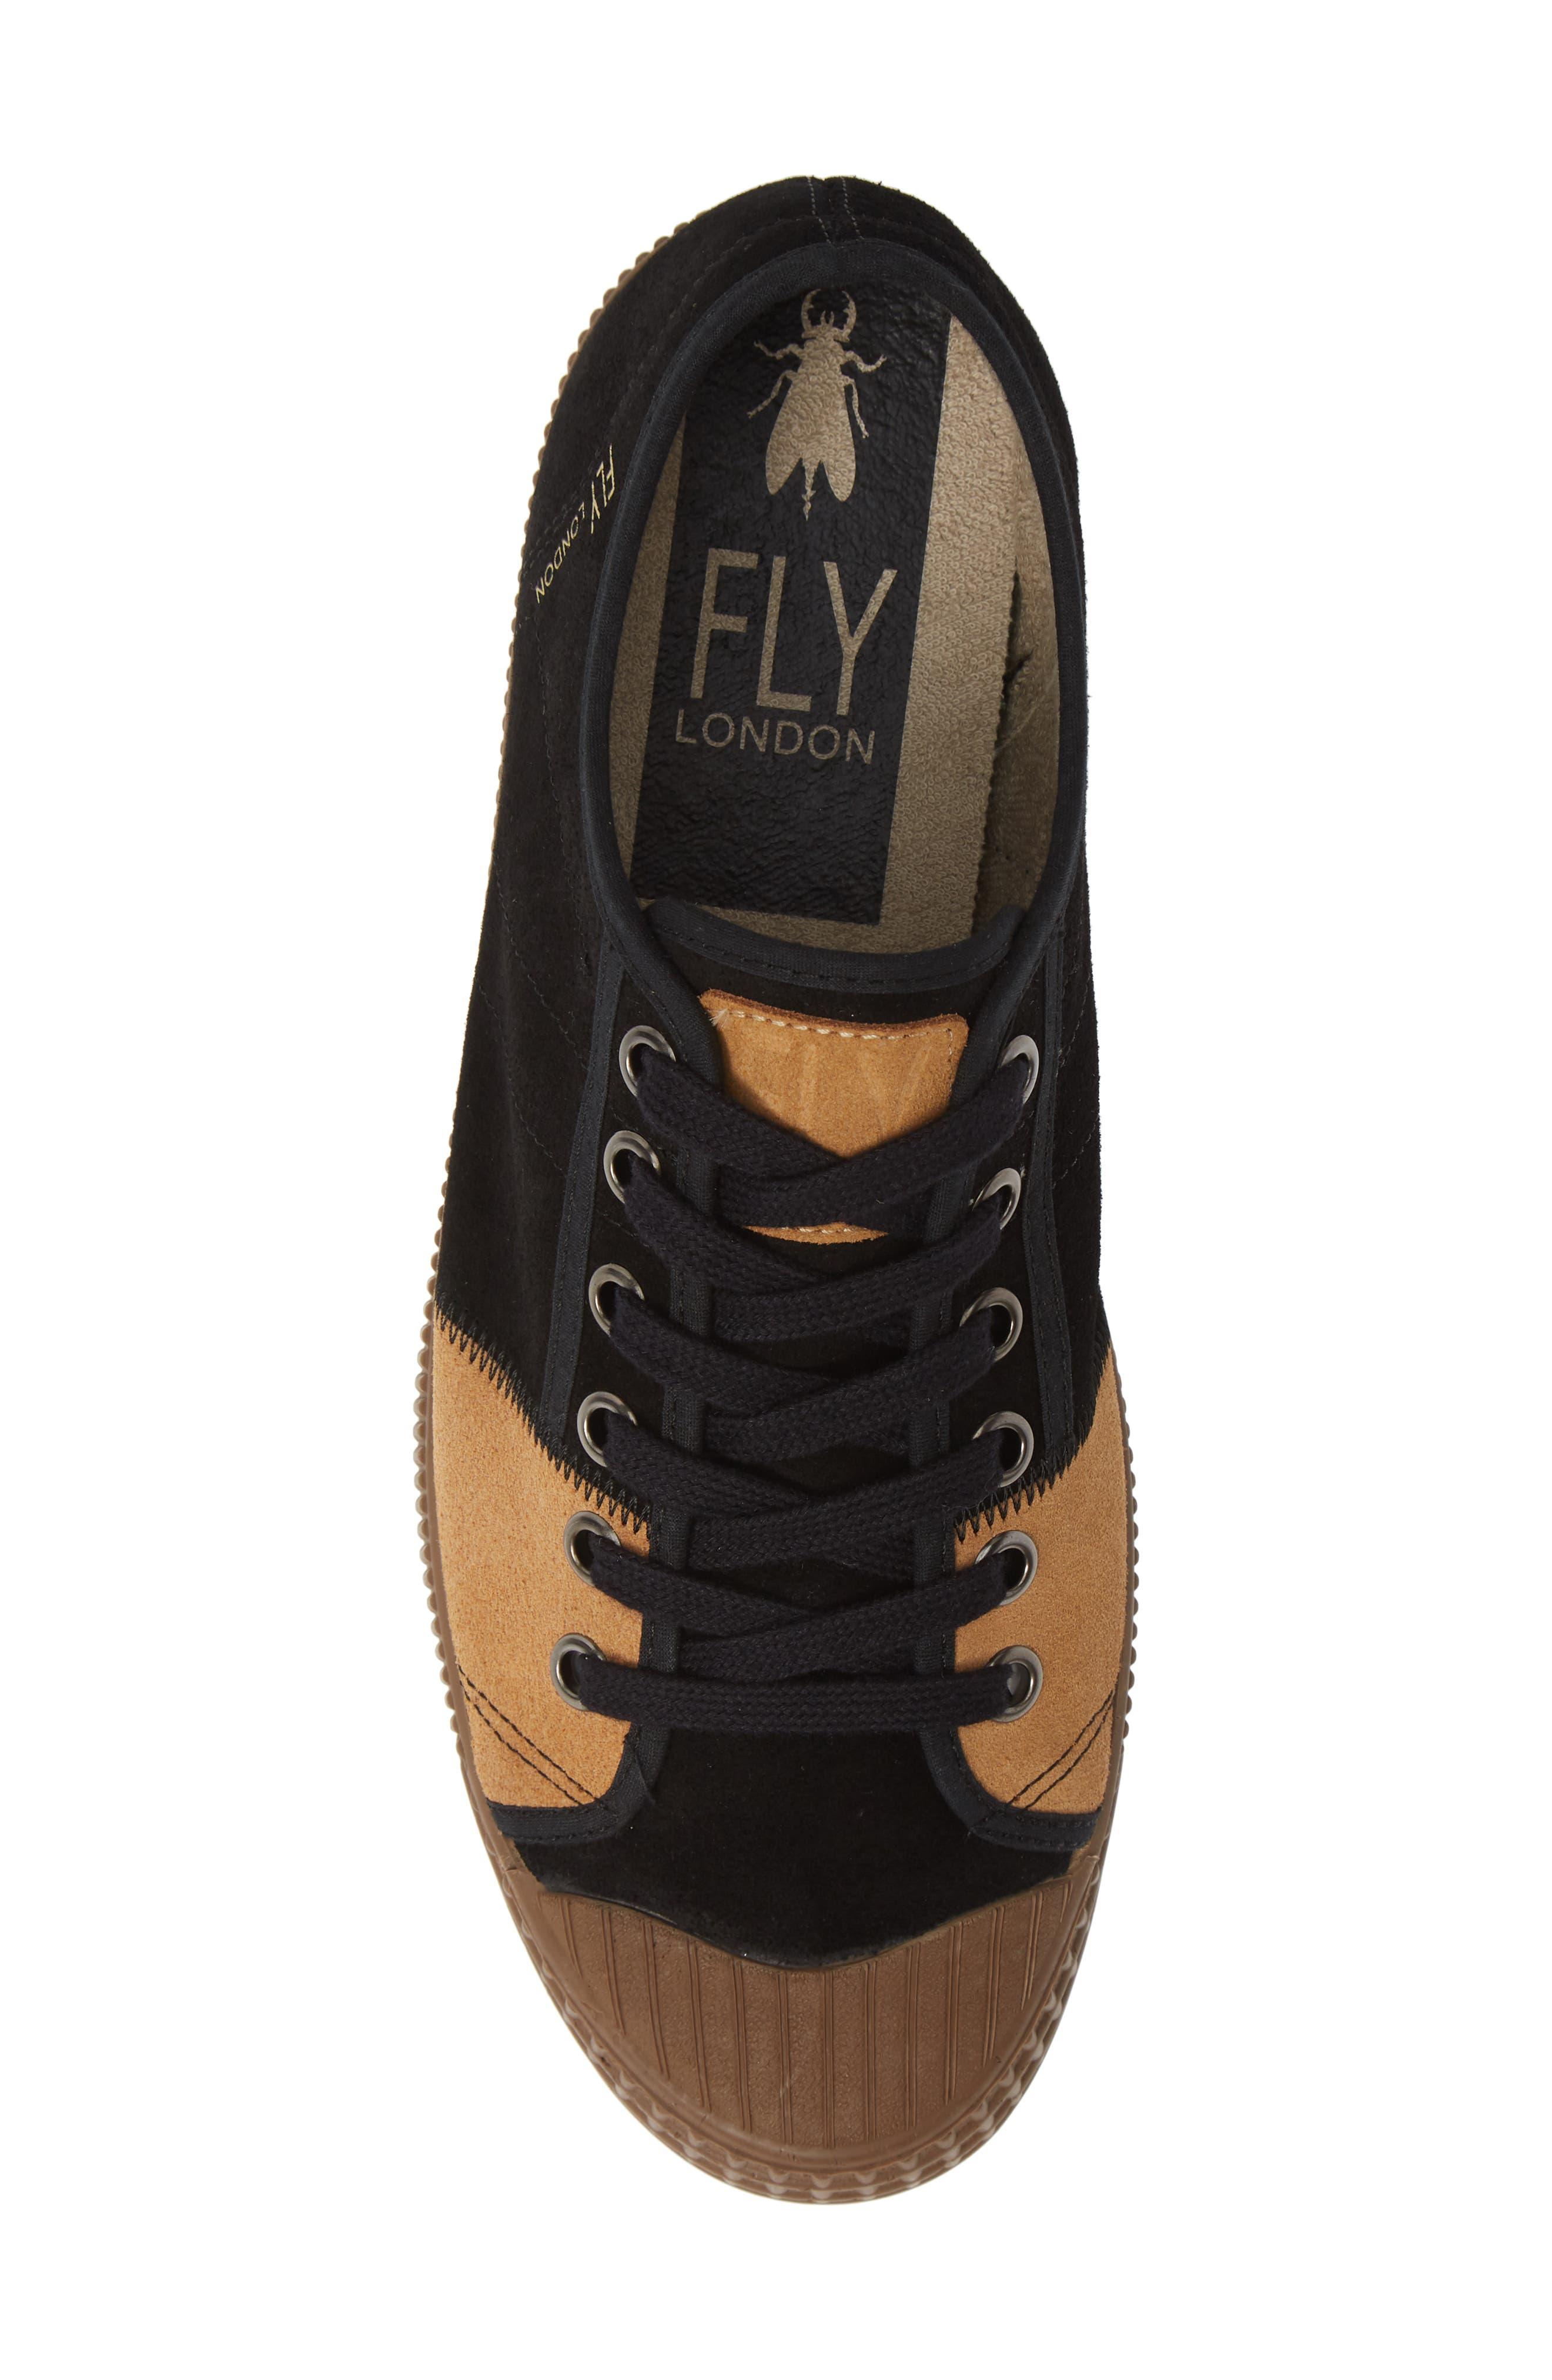 Foto Sneaker,                             Alternate thumbnail 5, color,                             BLACK/ CAMEL SUEDE